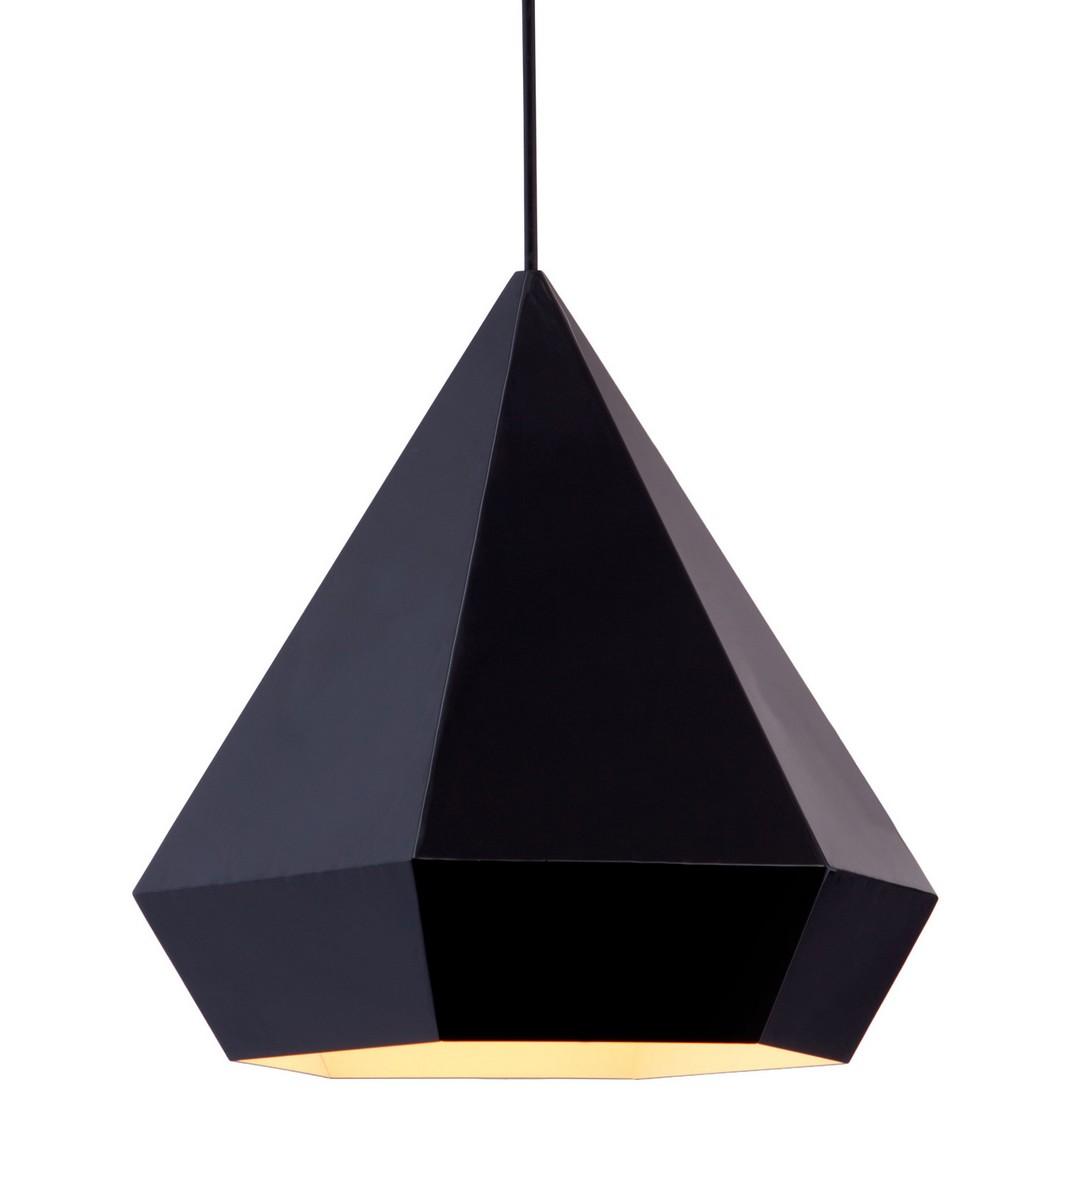 Zuo Modern Forecast Ceiling Lamp - Black